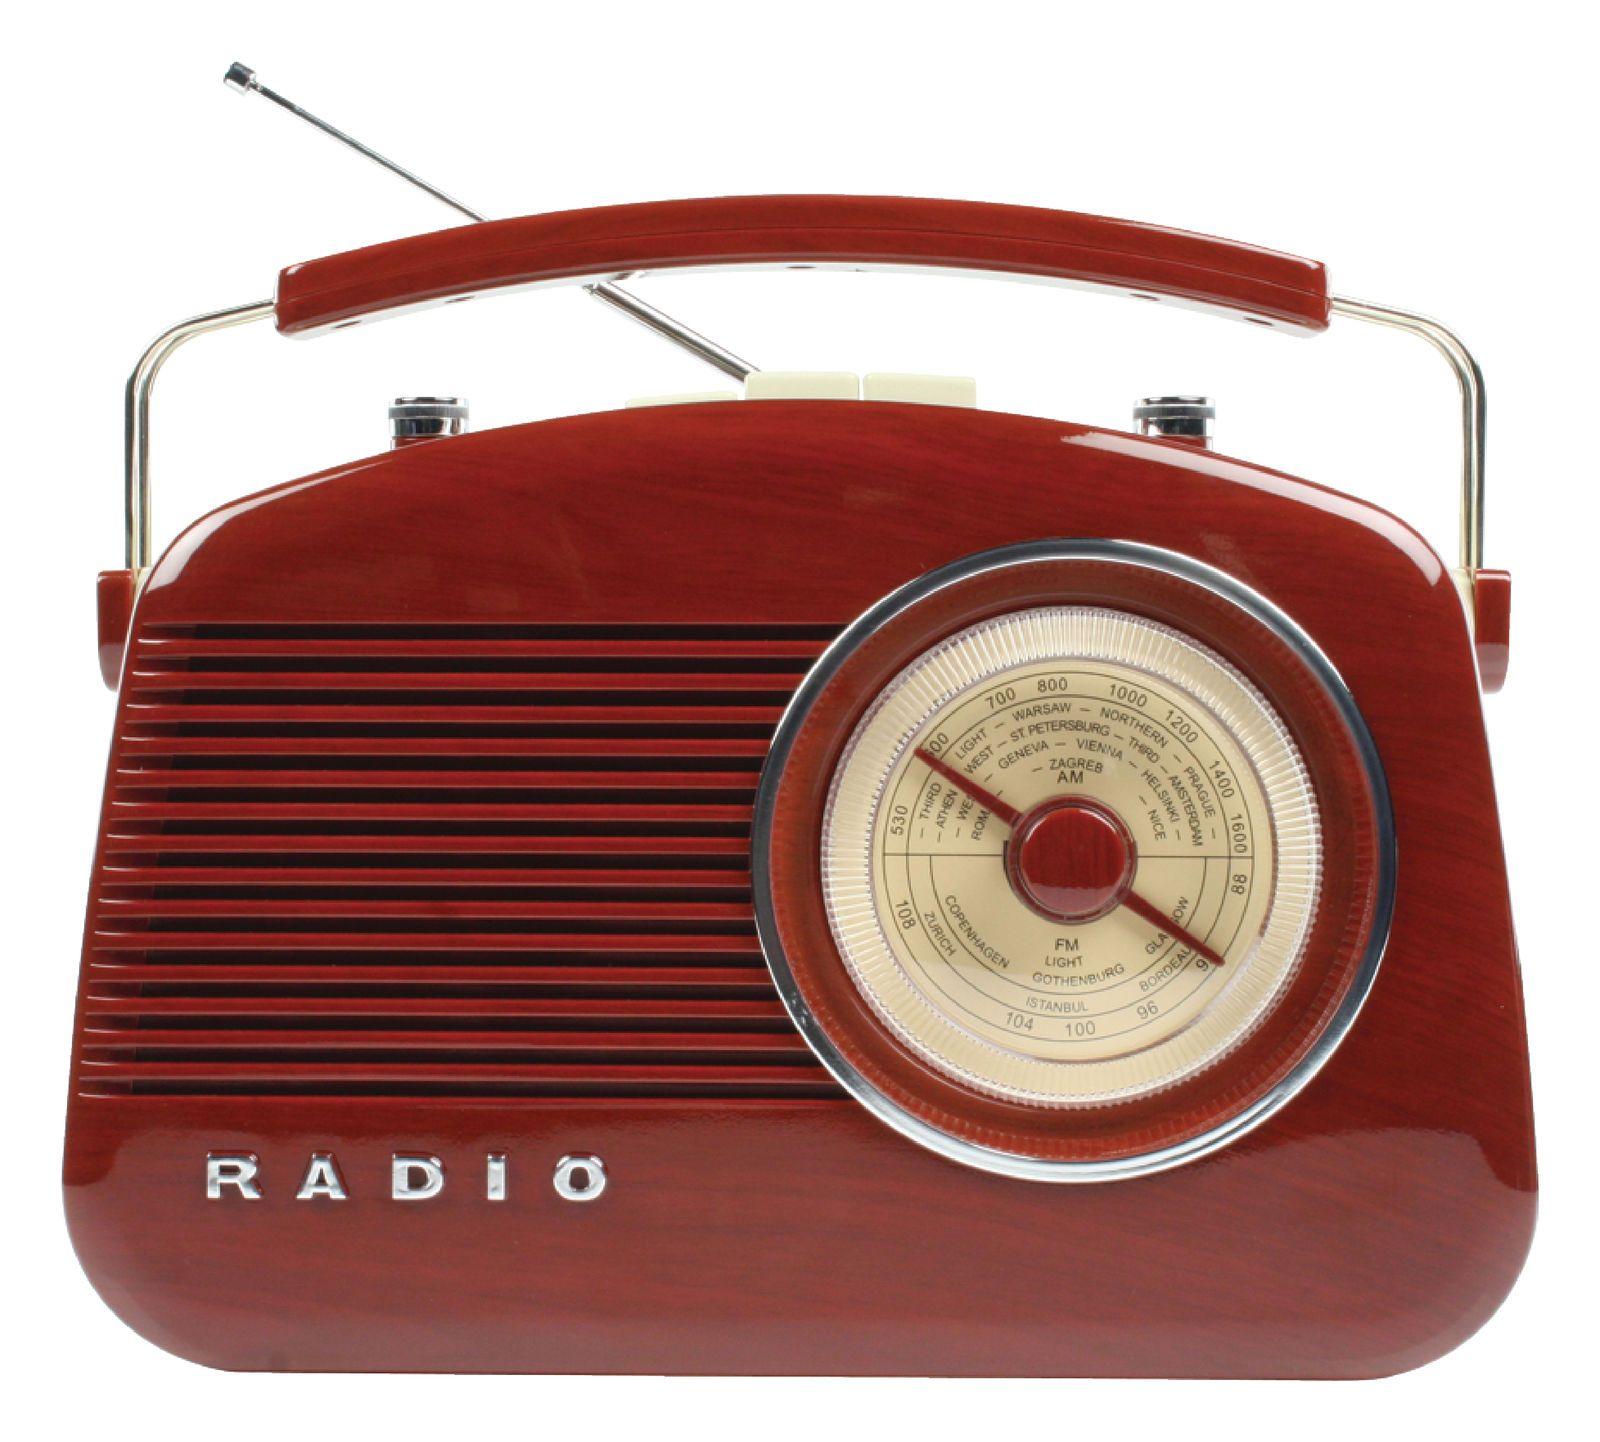 Konig Portable Radios  Ebay Sound  U0026 Vision In 2019